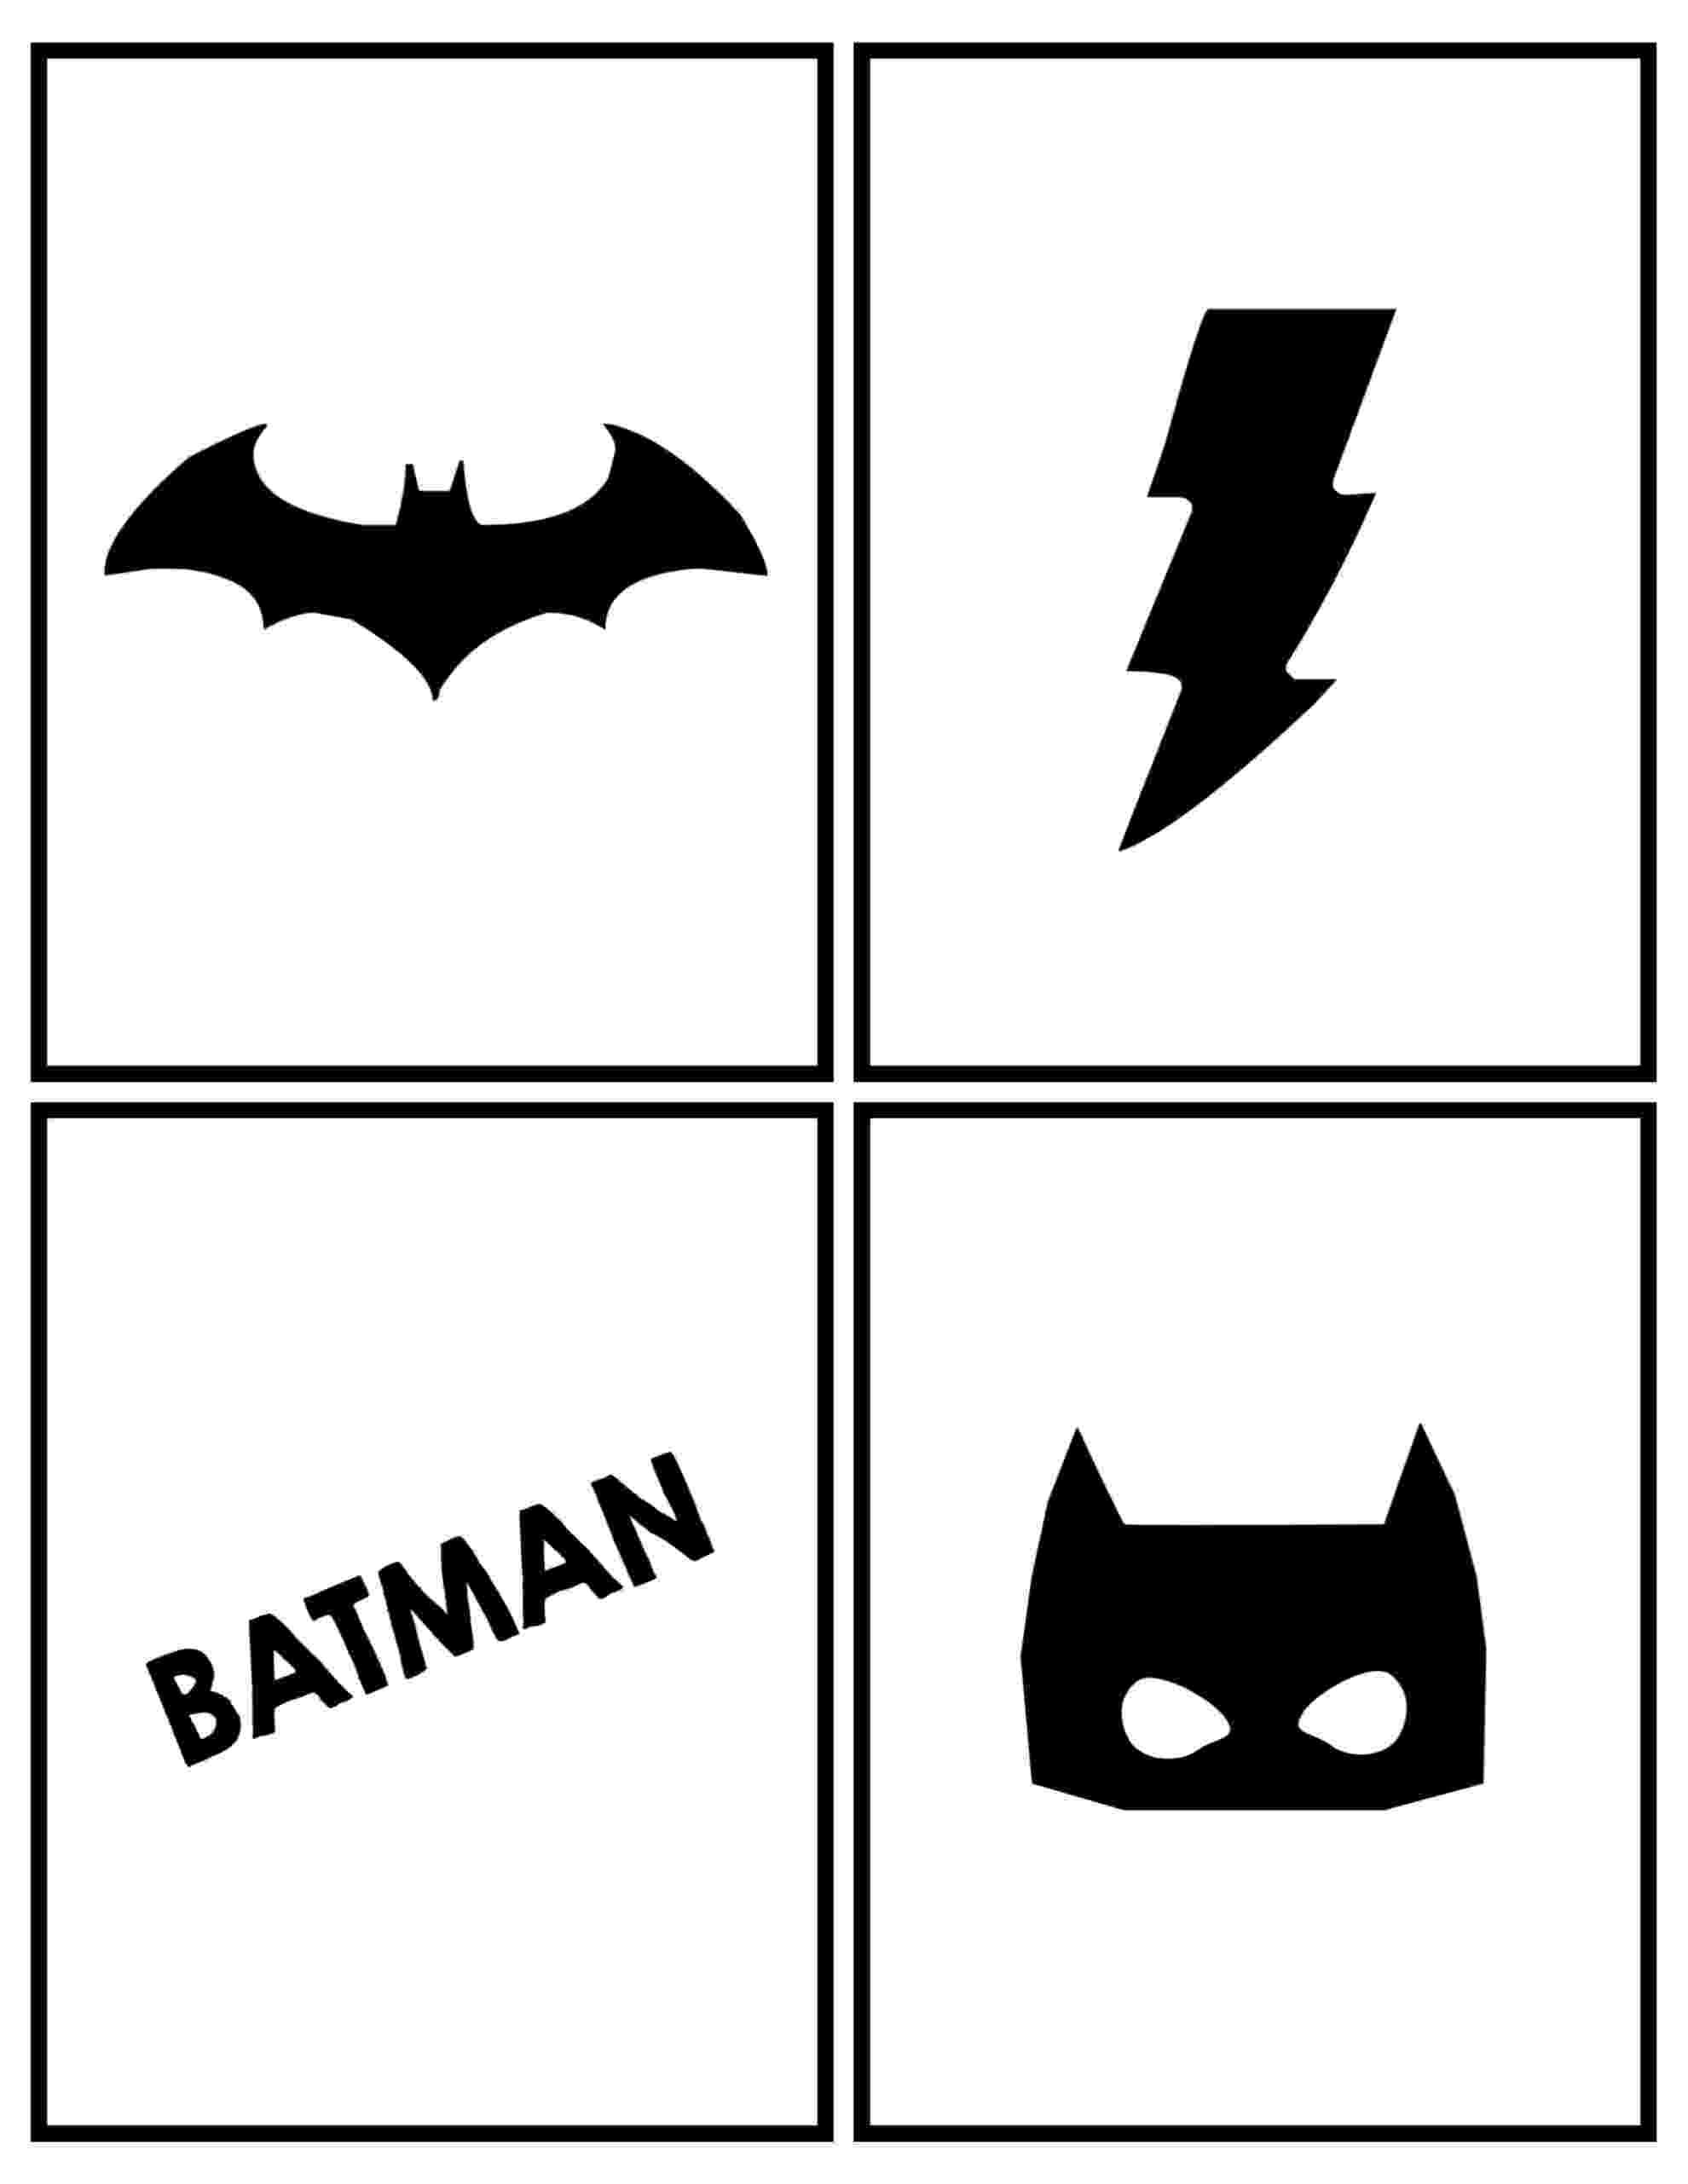 free batman printables batman party banner free printable paper trail design batman printables free